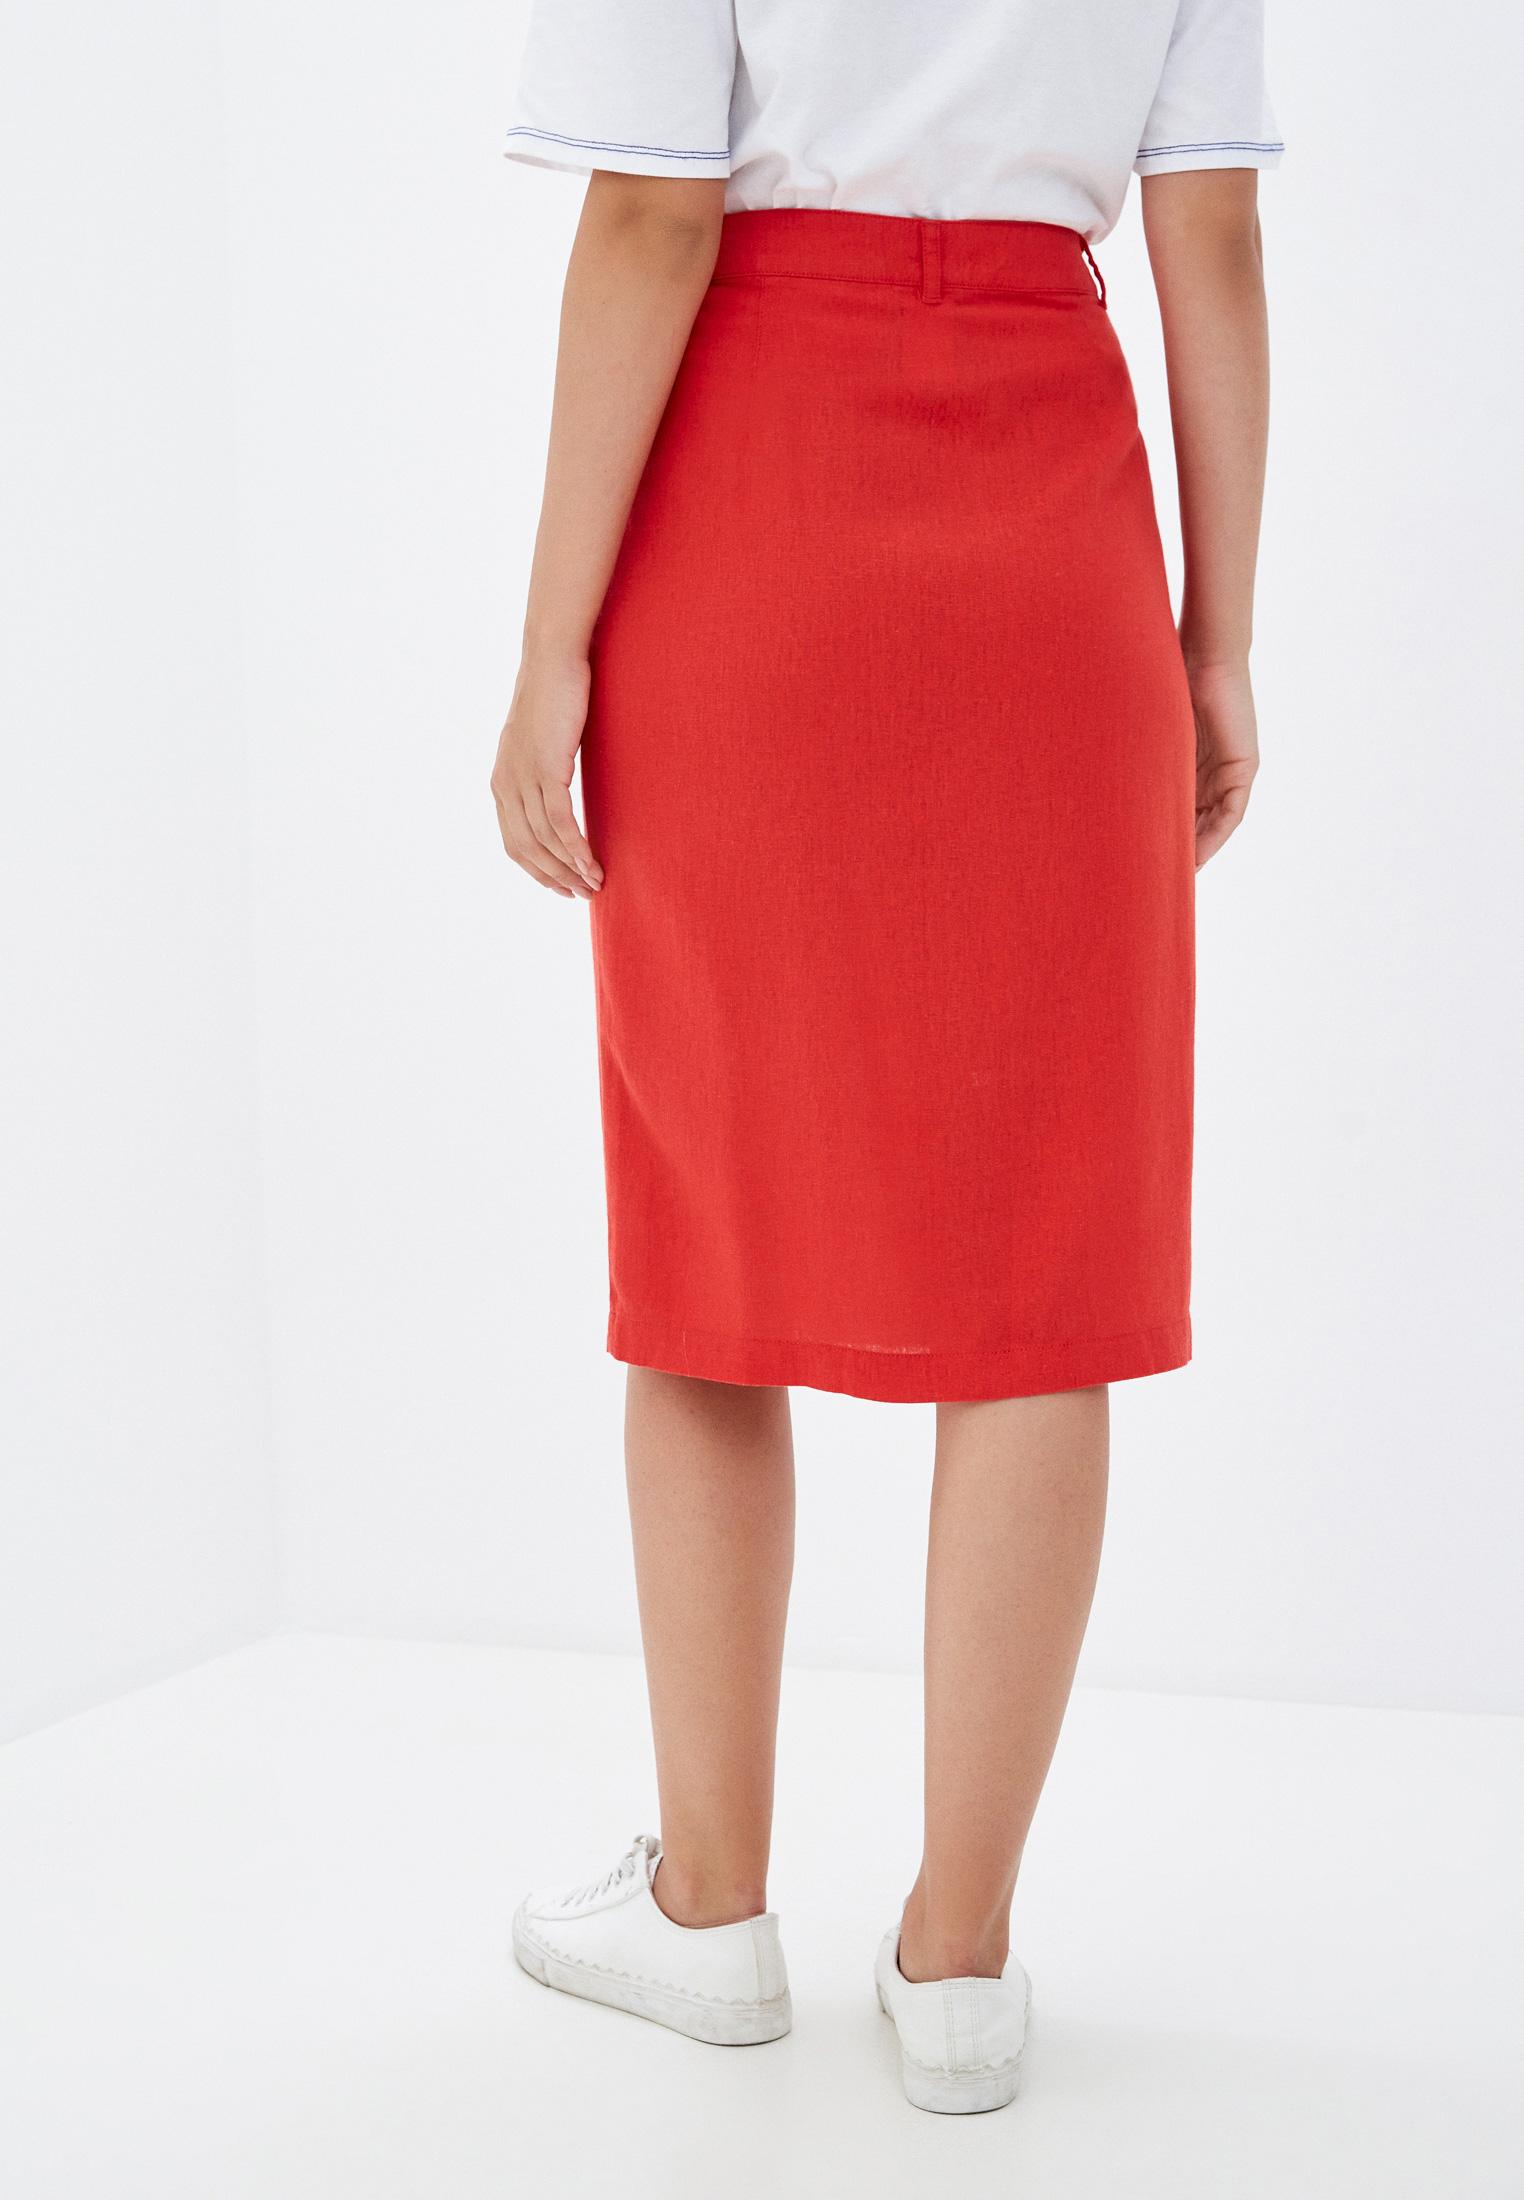 Прямая юбка Finn Flare (Фин Флаер) S19-14081: изображение 3